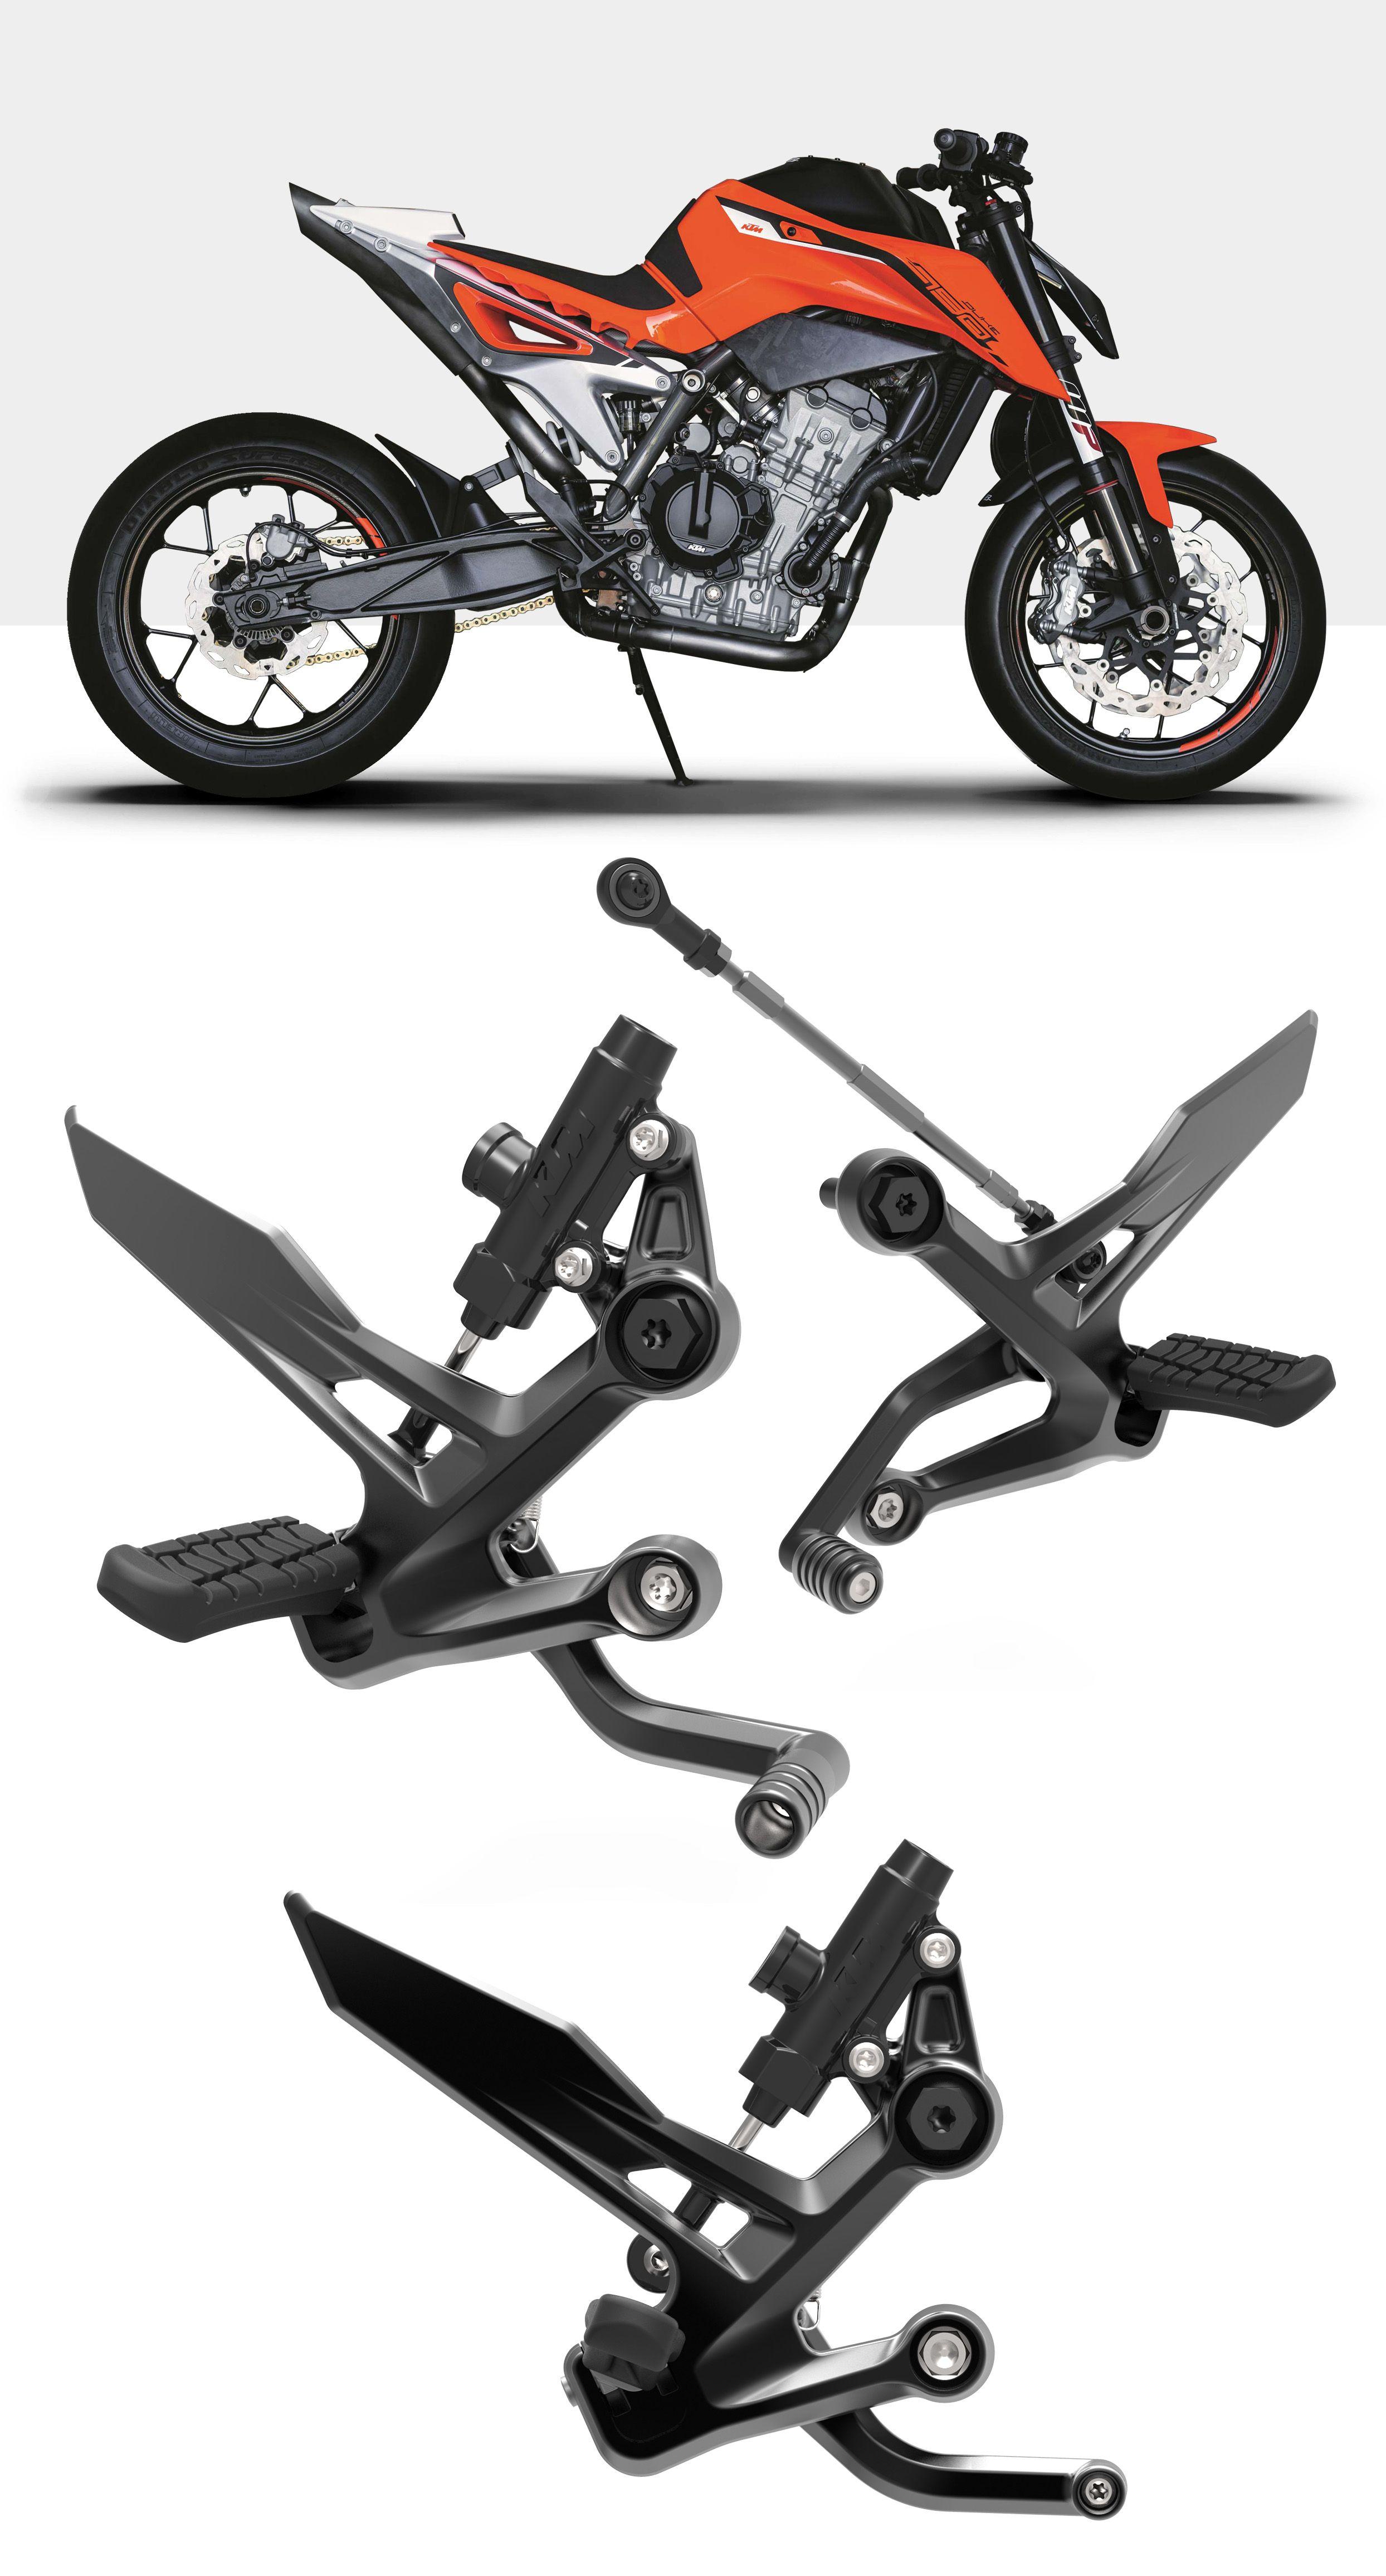 Ktm Foot Pegs Design Concept